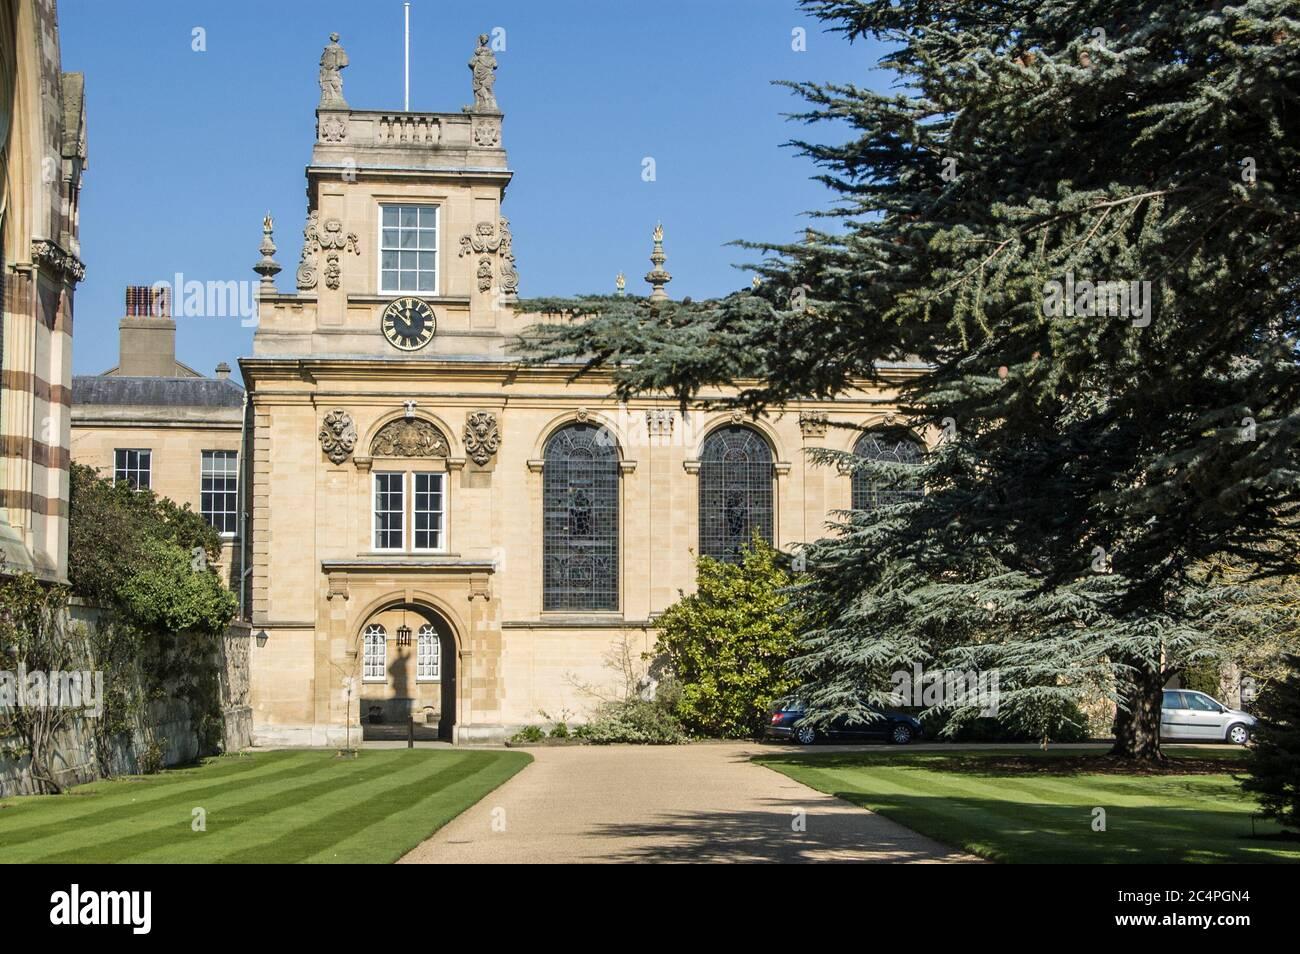 Clocktower and quadrangle, Balliol College, Oxford University. Stock Photo